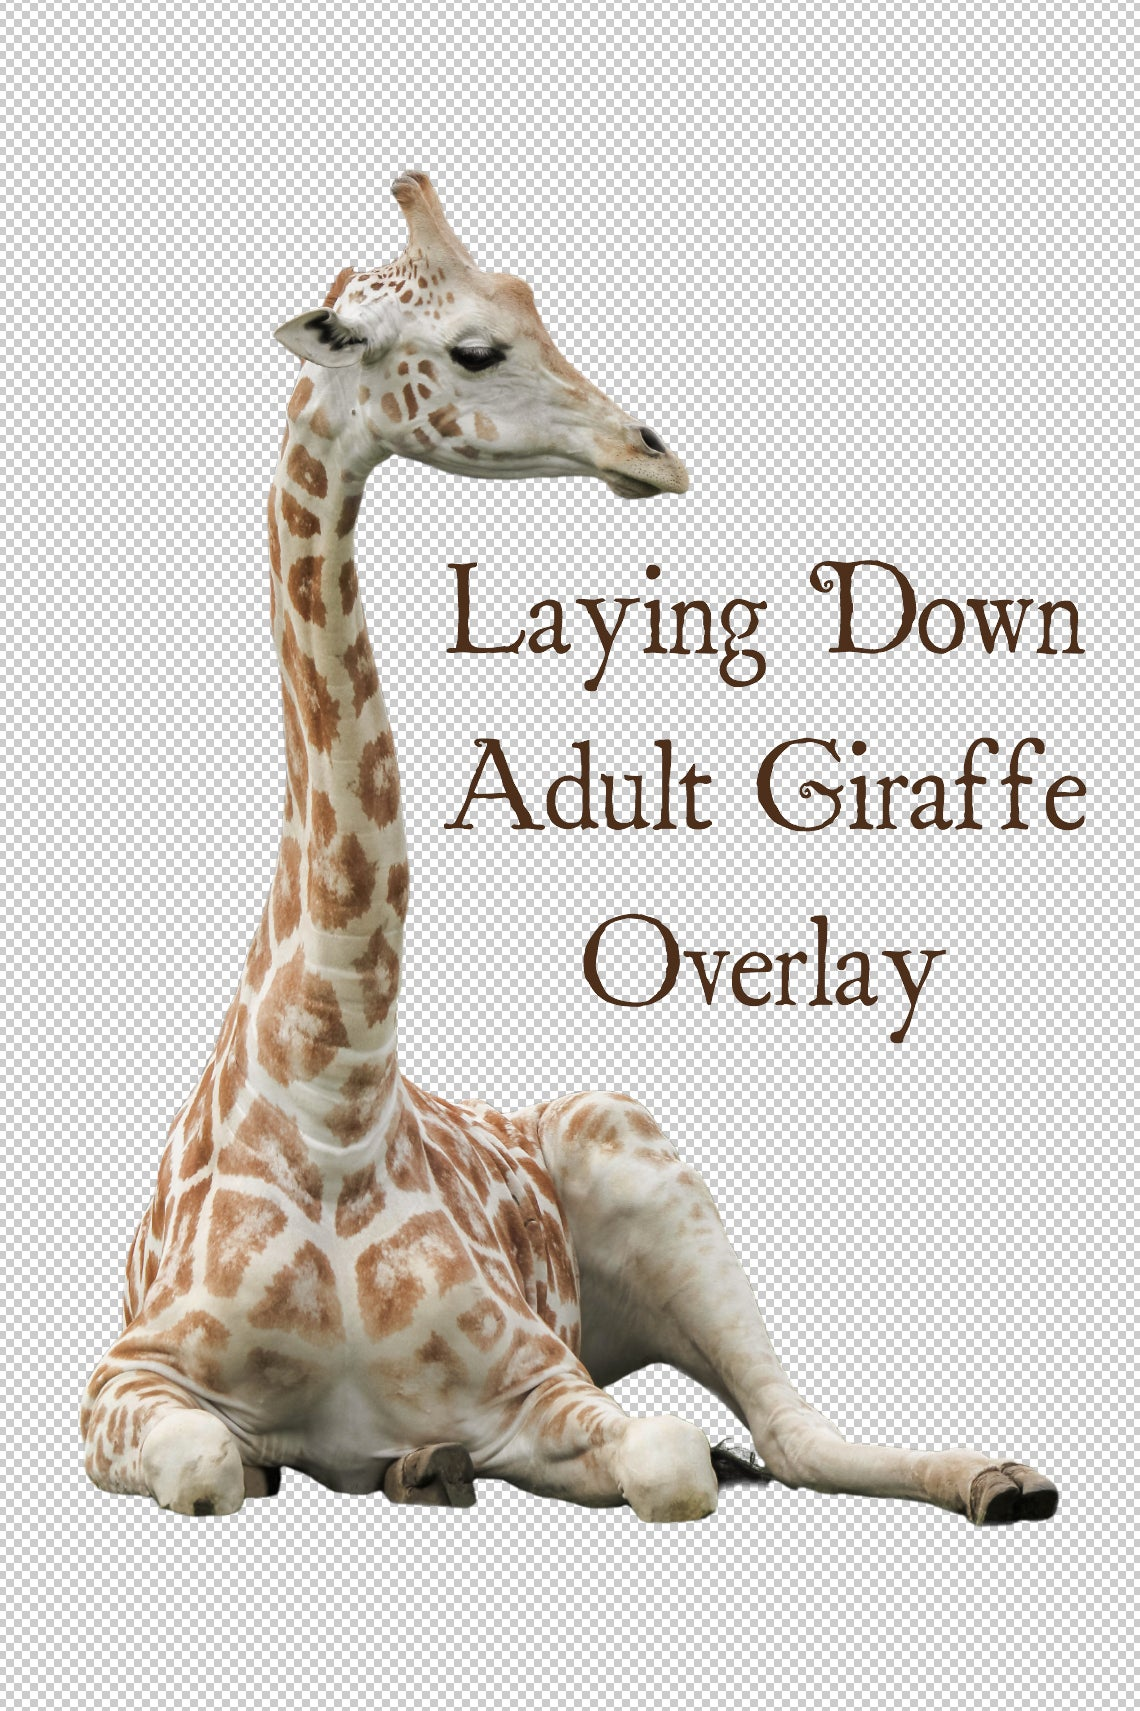 Image of Laying Down Adult Giraffe Overlay